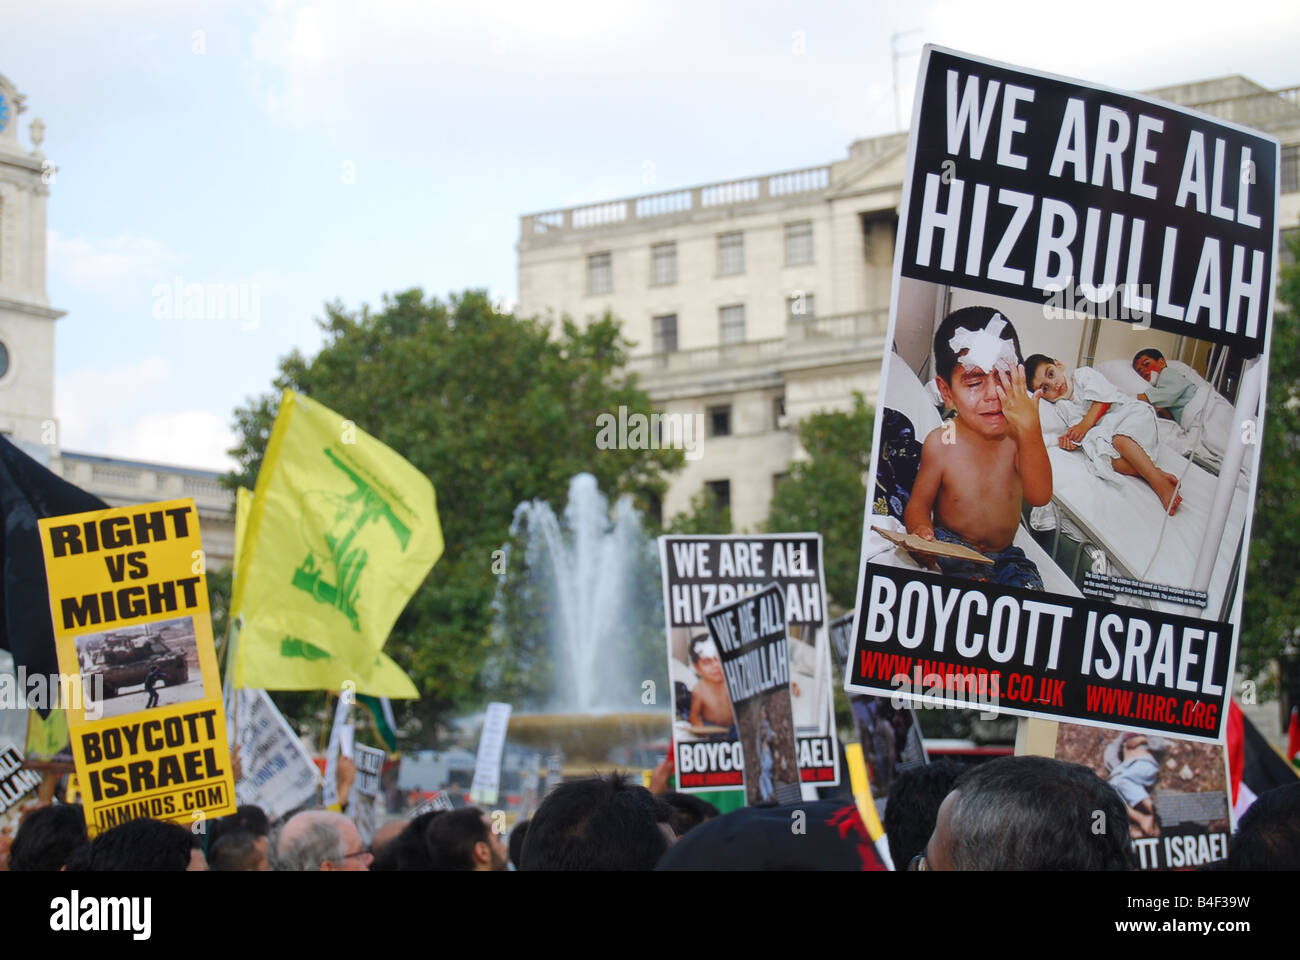 Hizbollah 'al quds' Palestinians - Stock Image